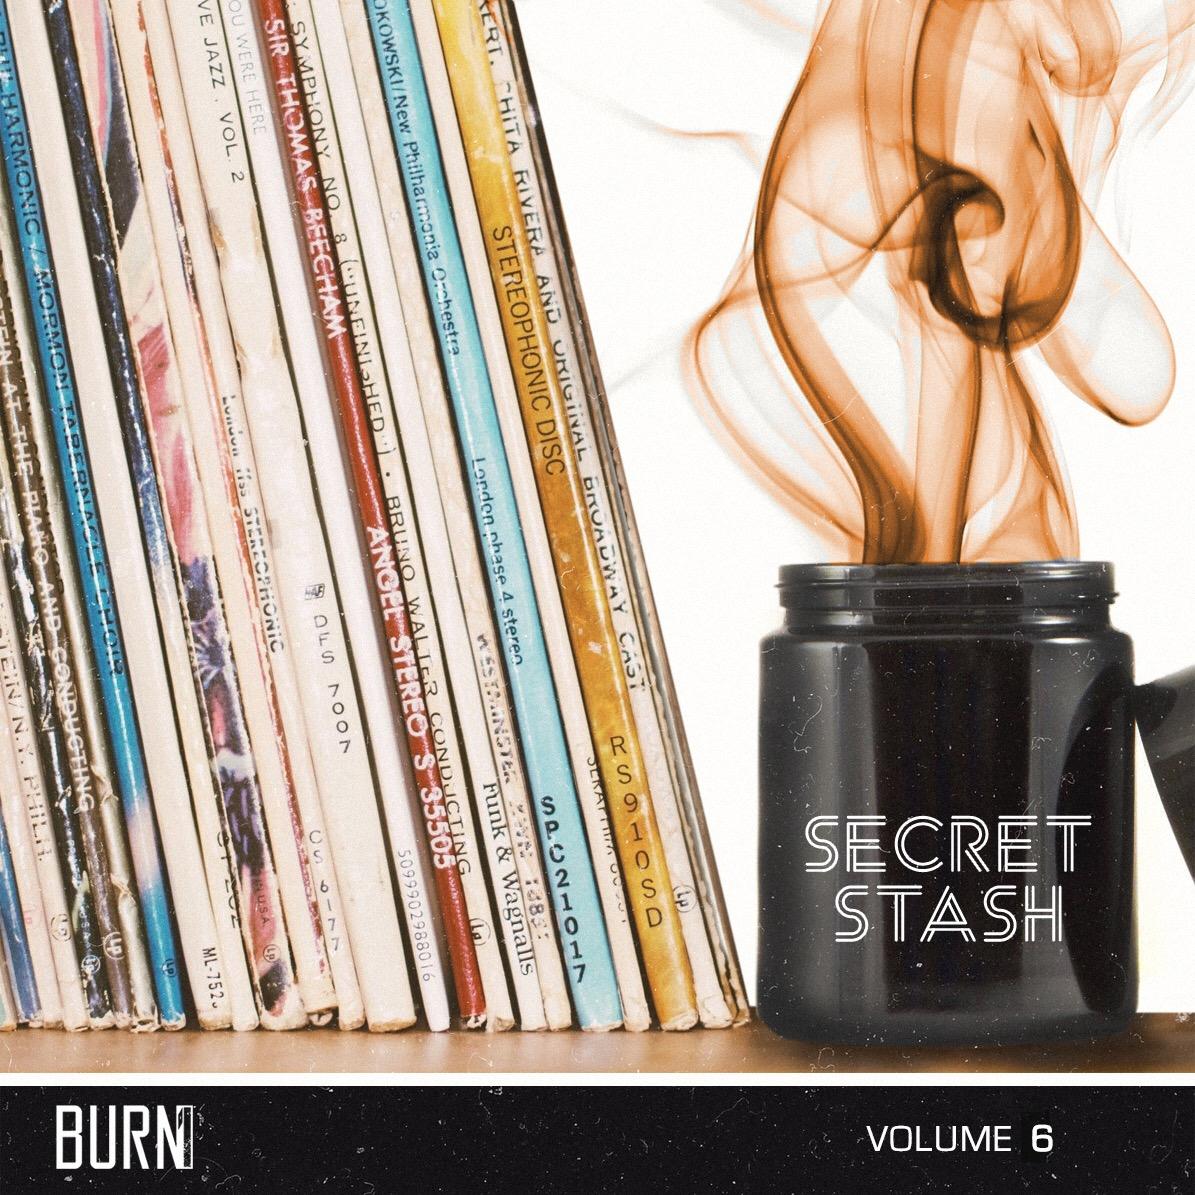 Burn1 Secret Stash (Vol. 6)